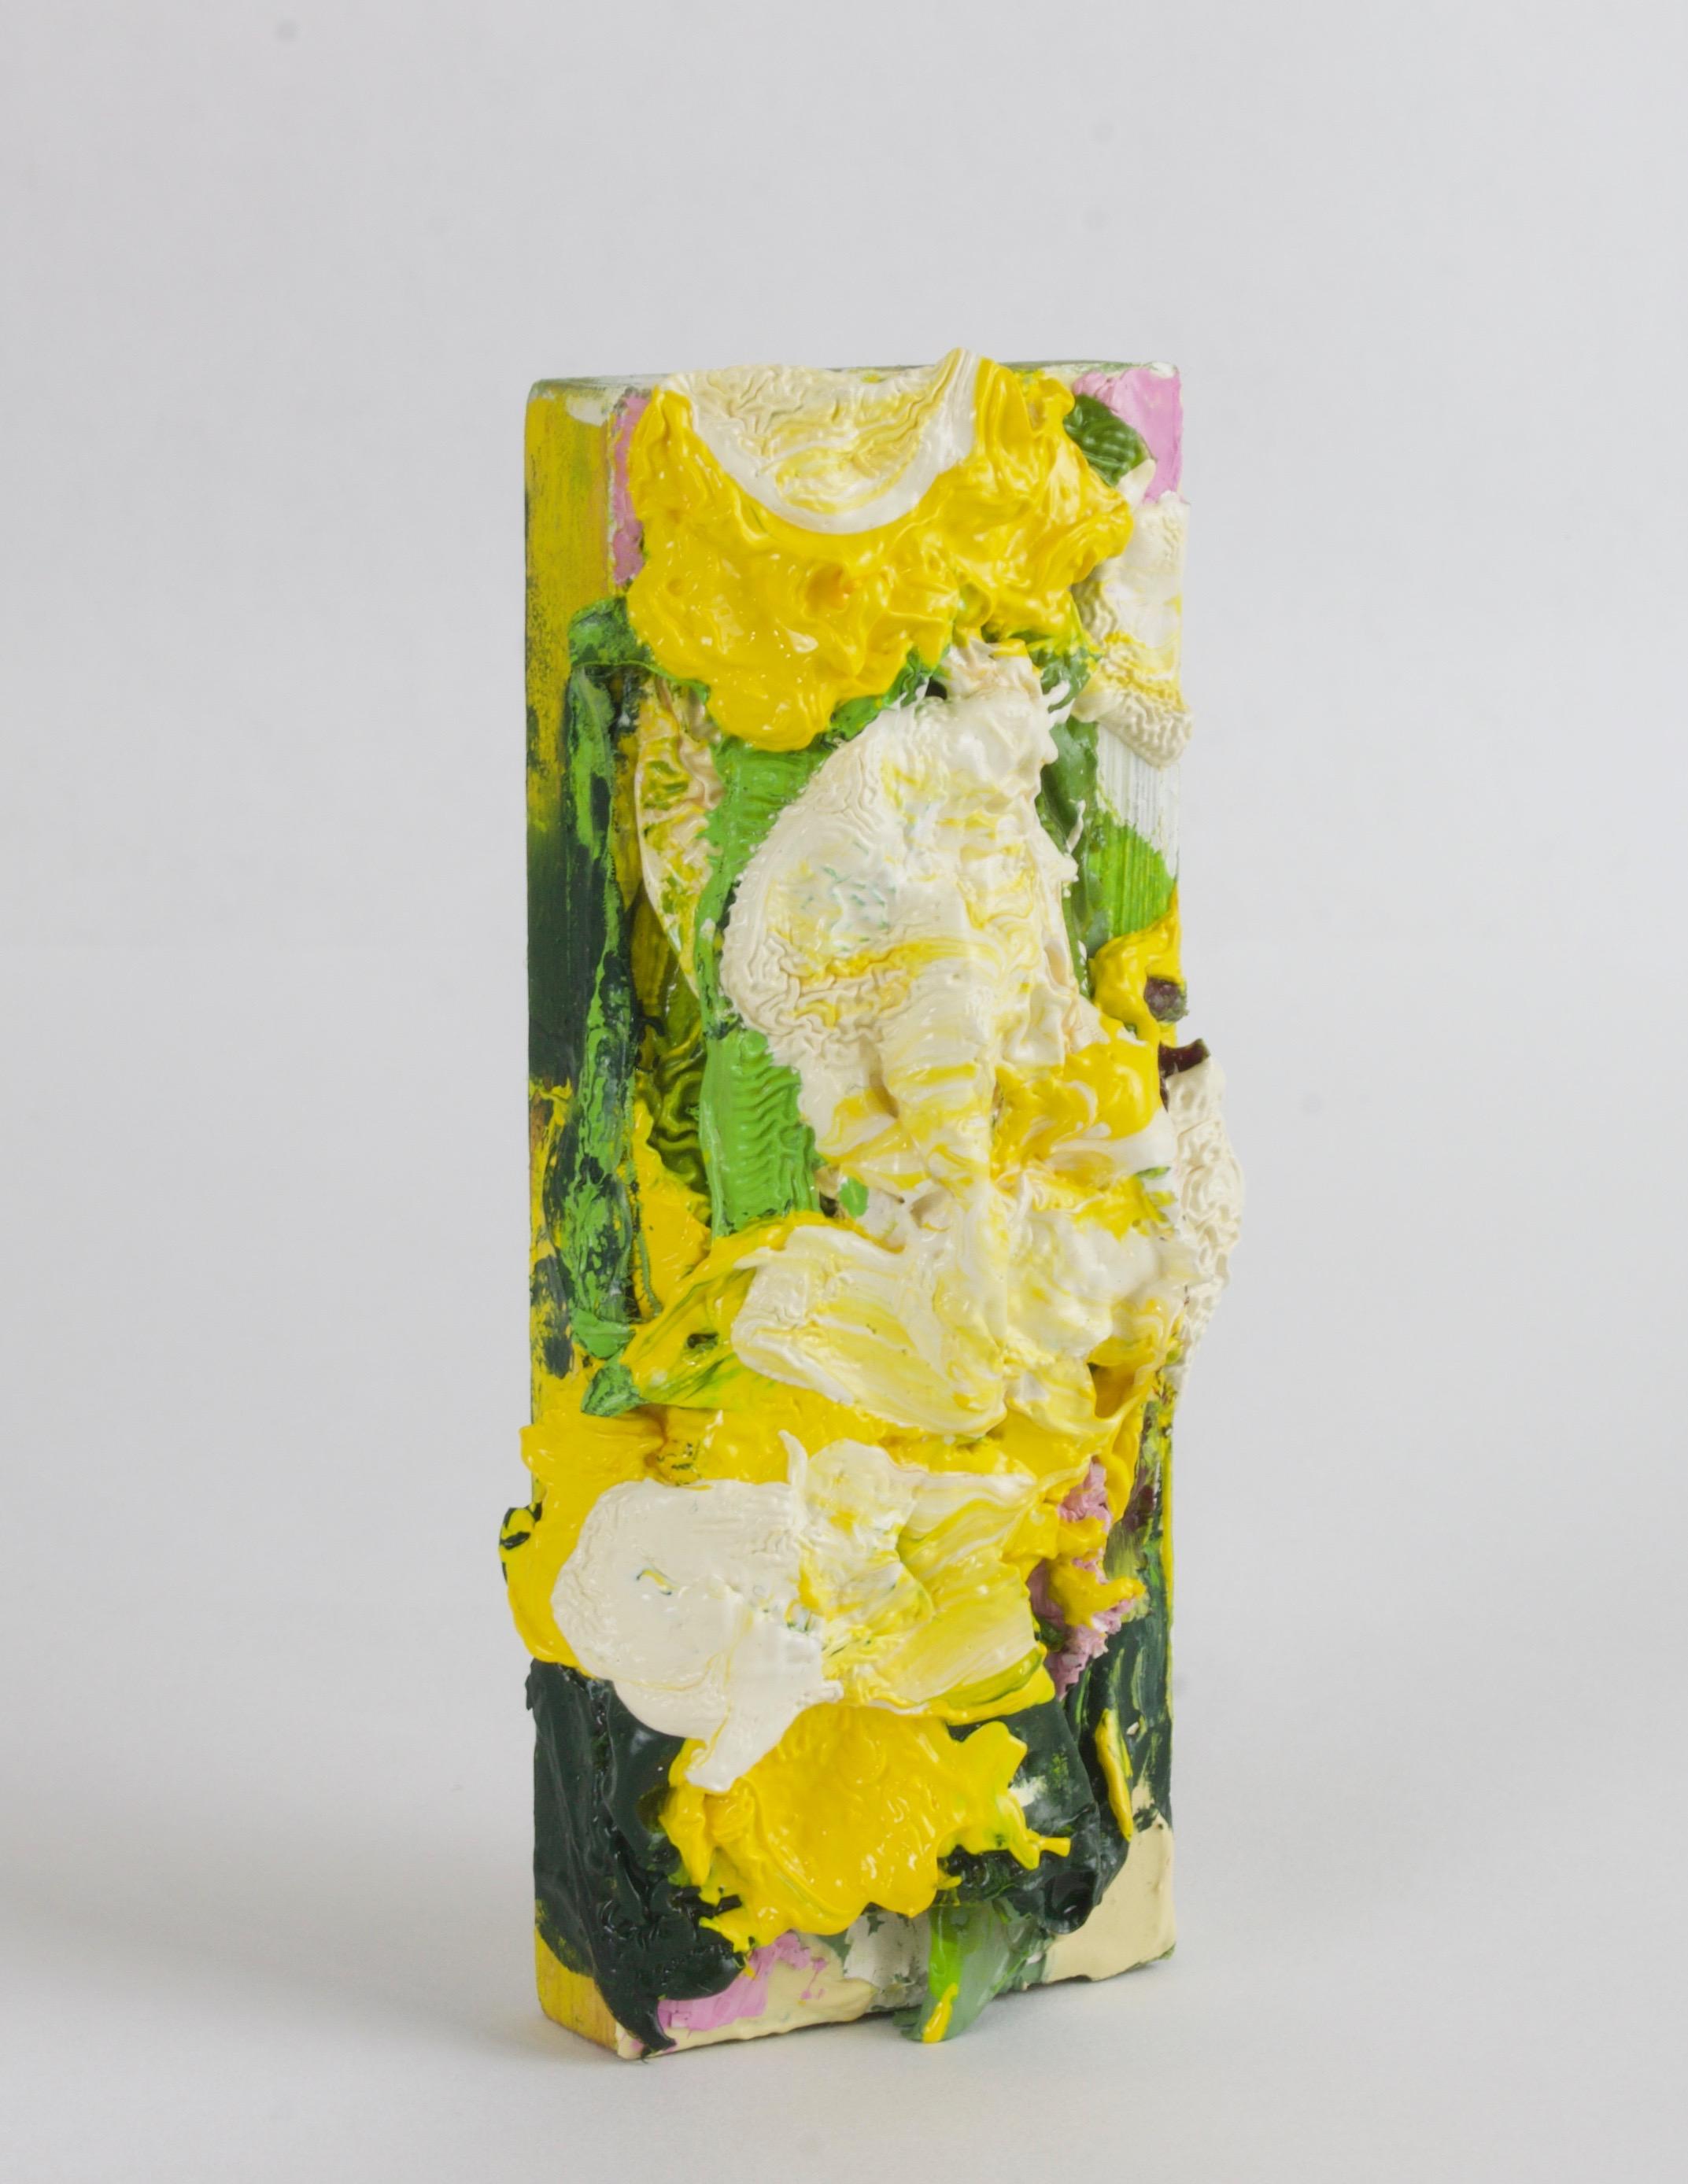 Untitled (Yellow Flourish)